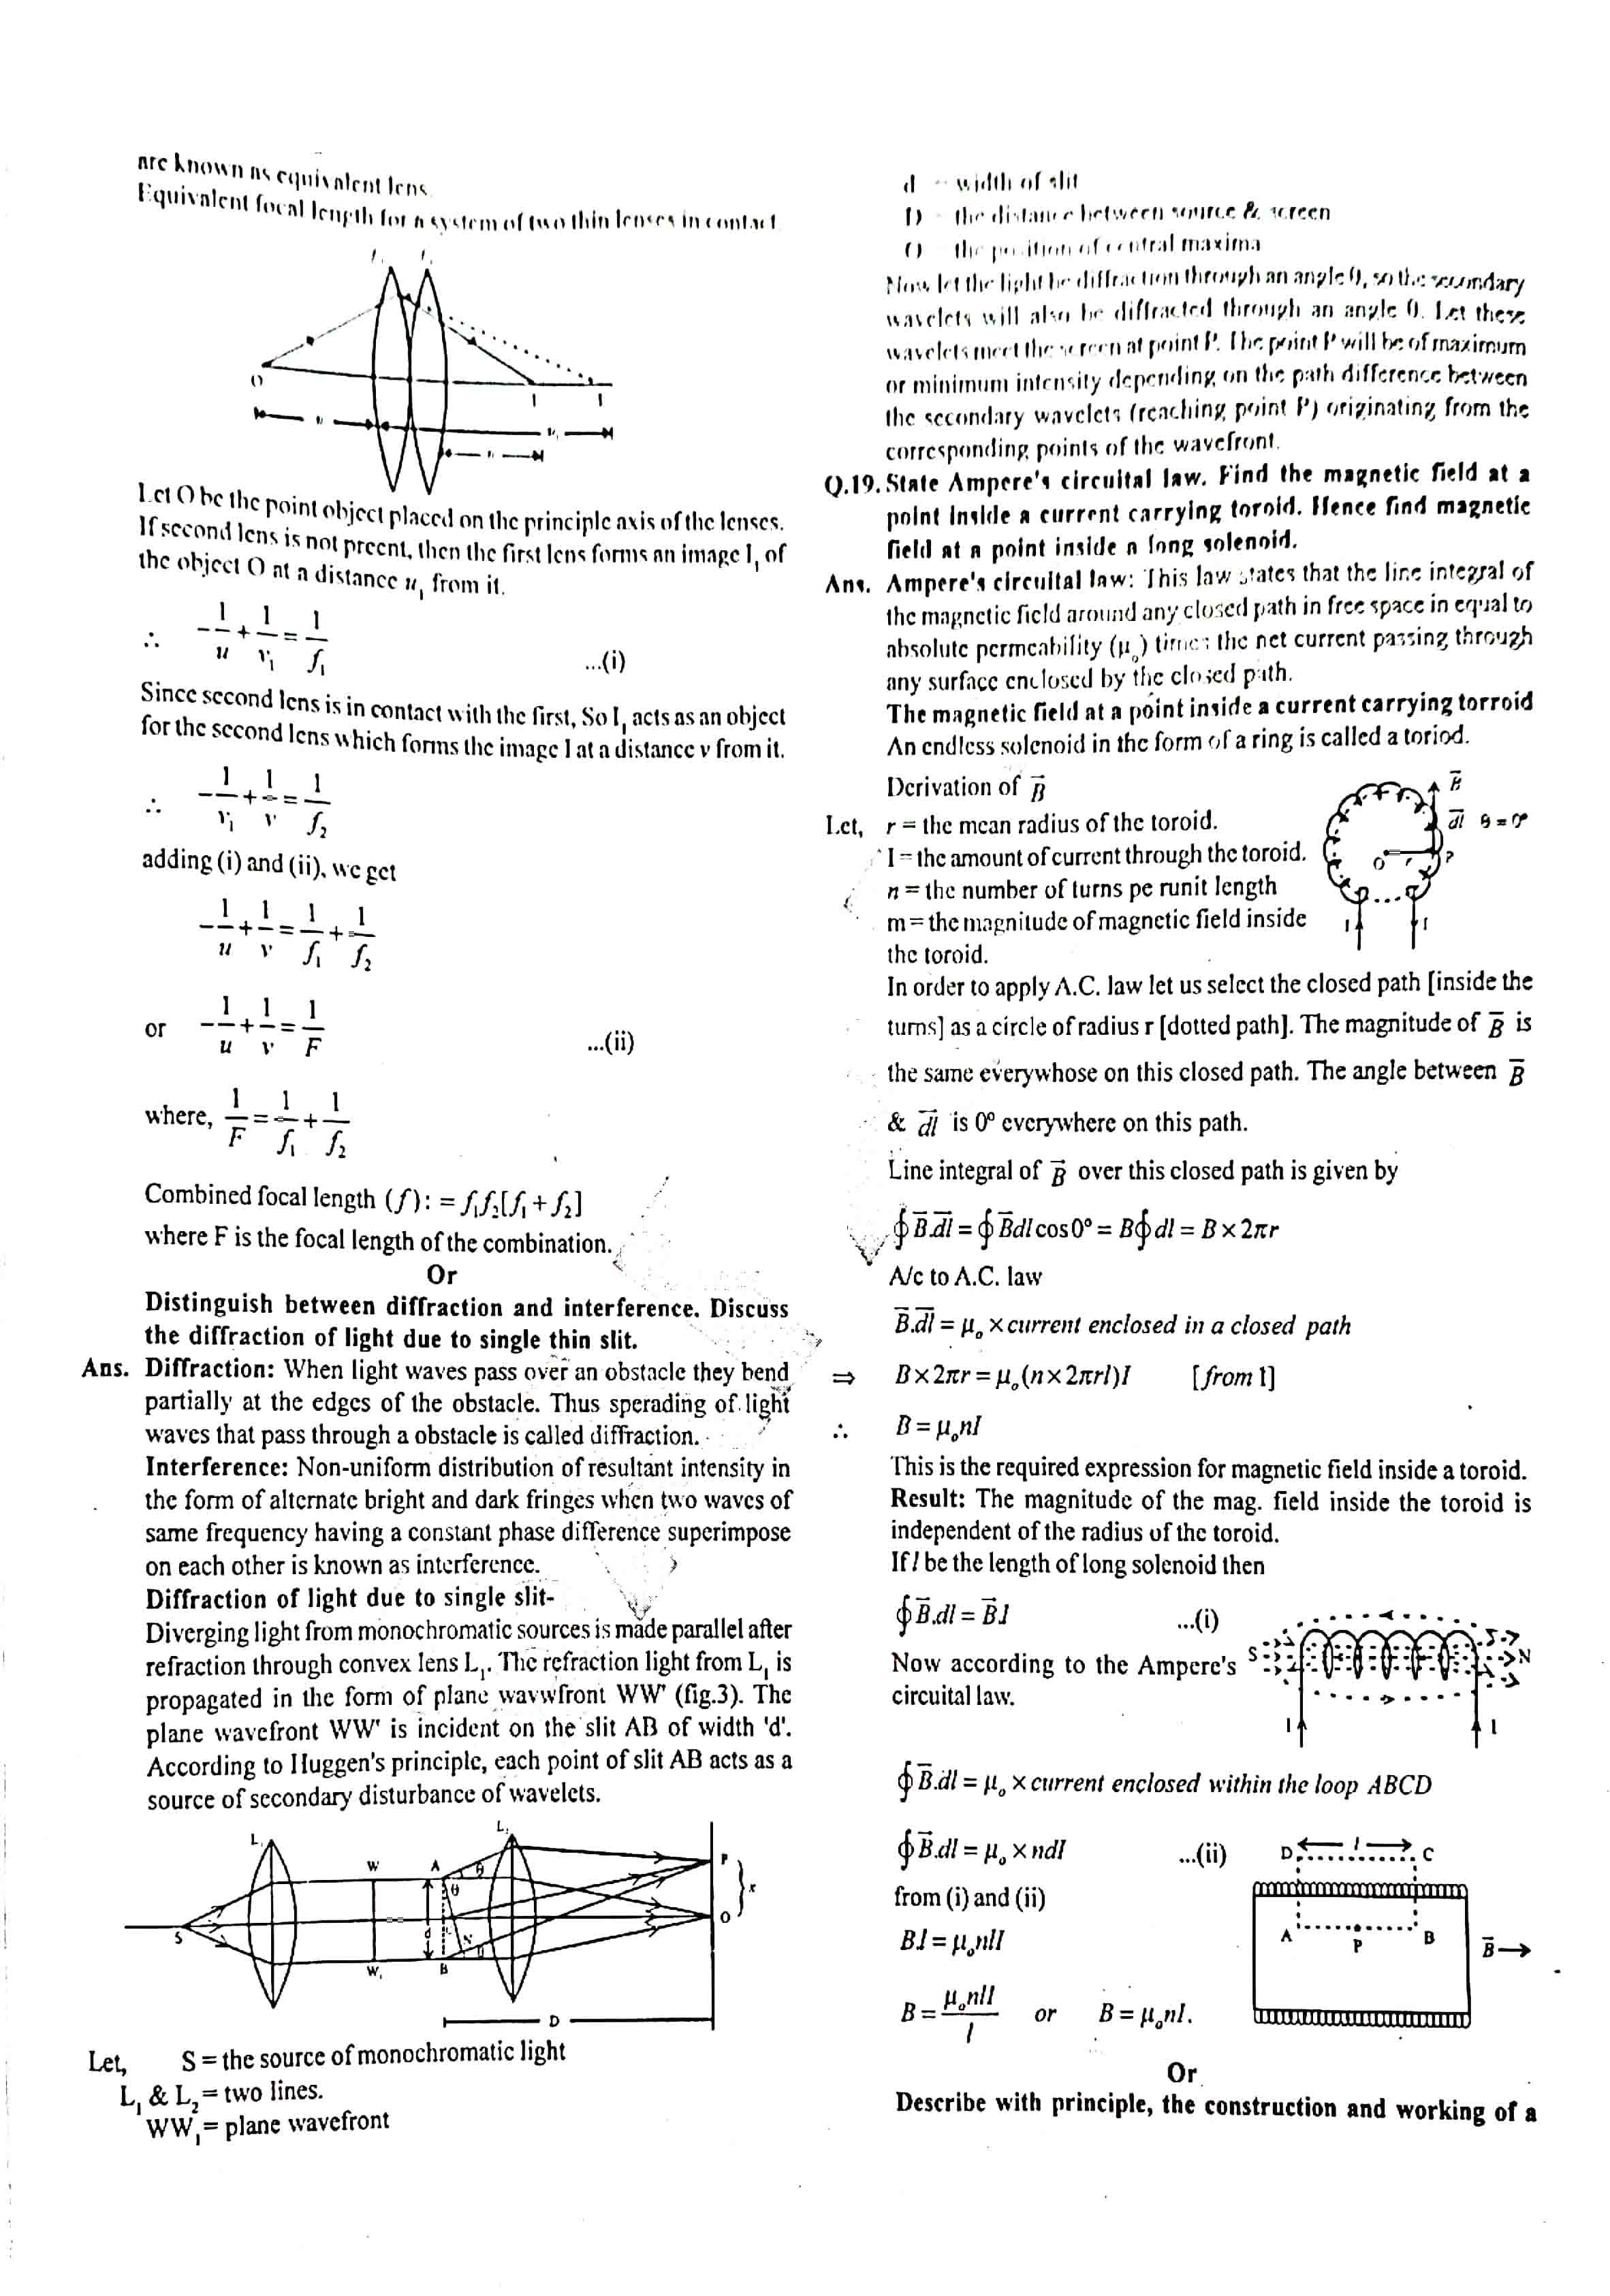 JAC Class 12 Physics 2015 Question Paper 04